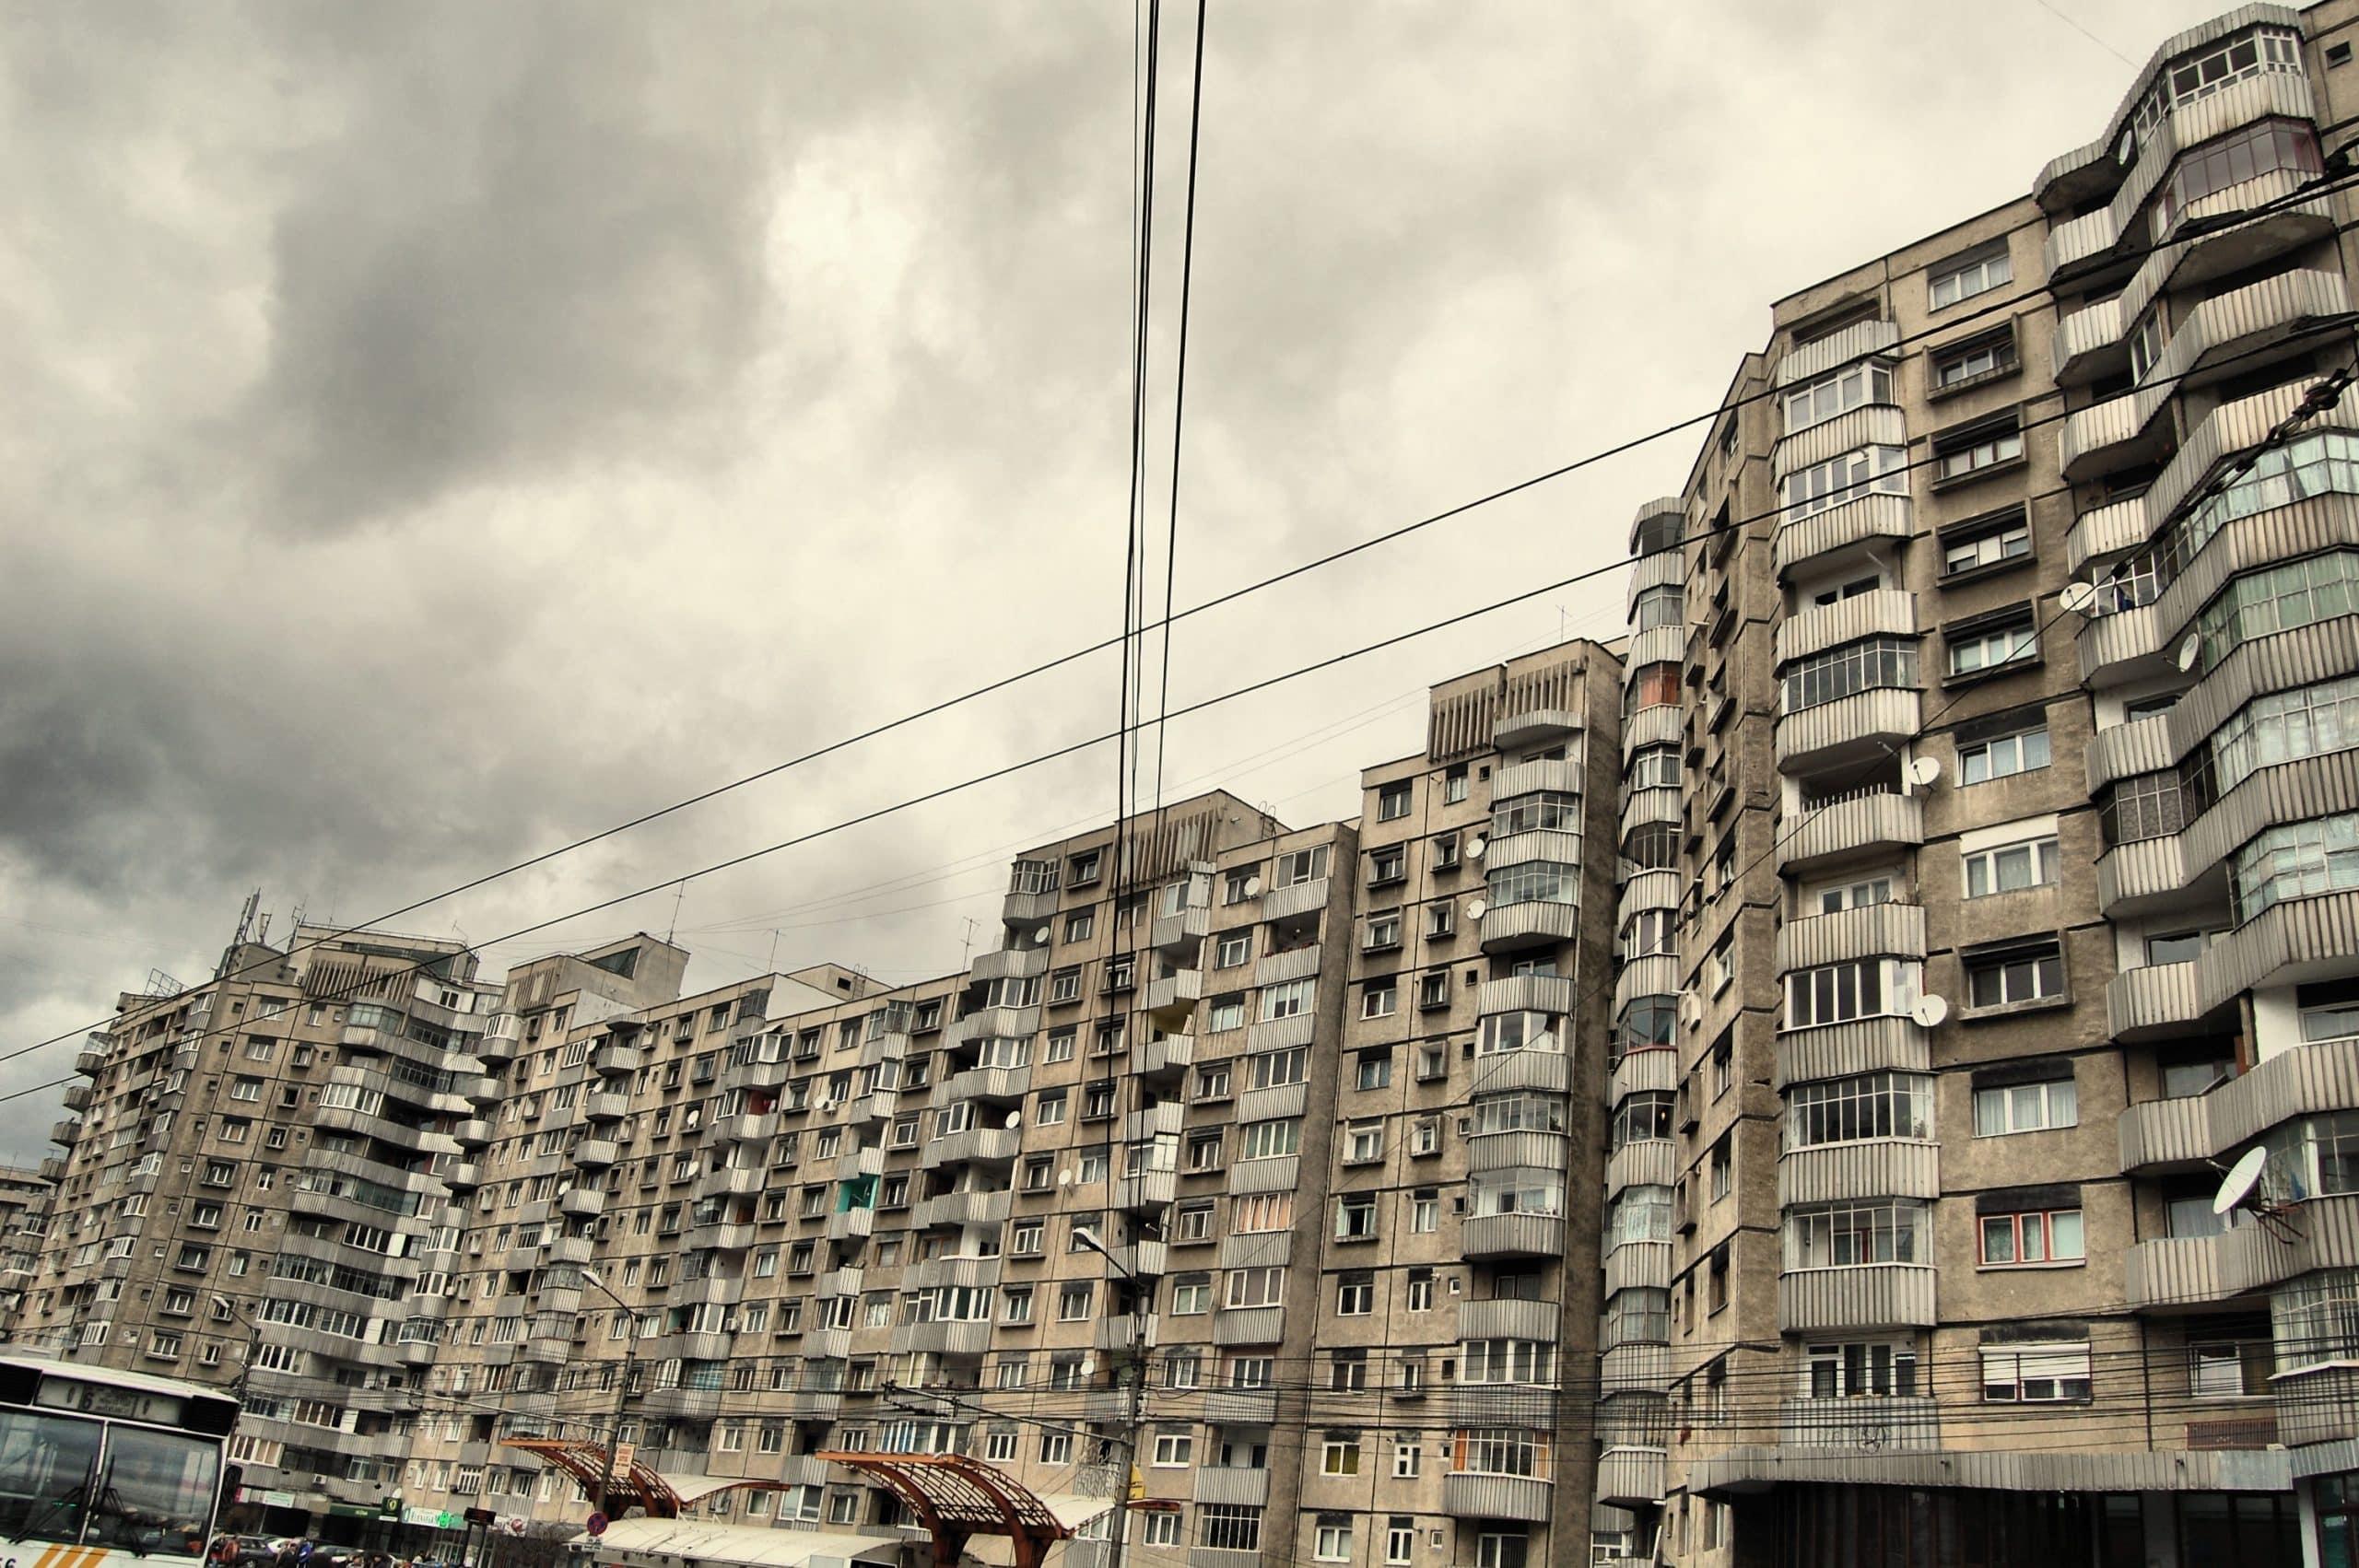 entendiendo europa del este la arquitectura brutalista